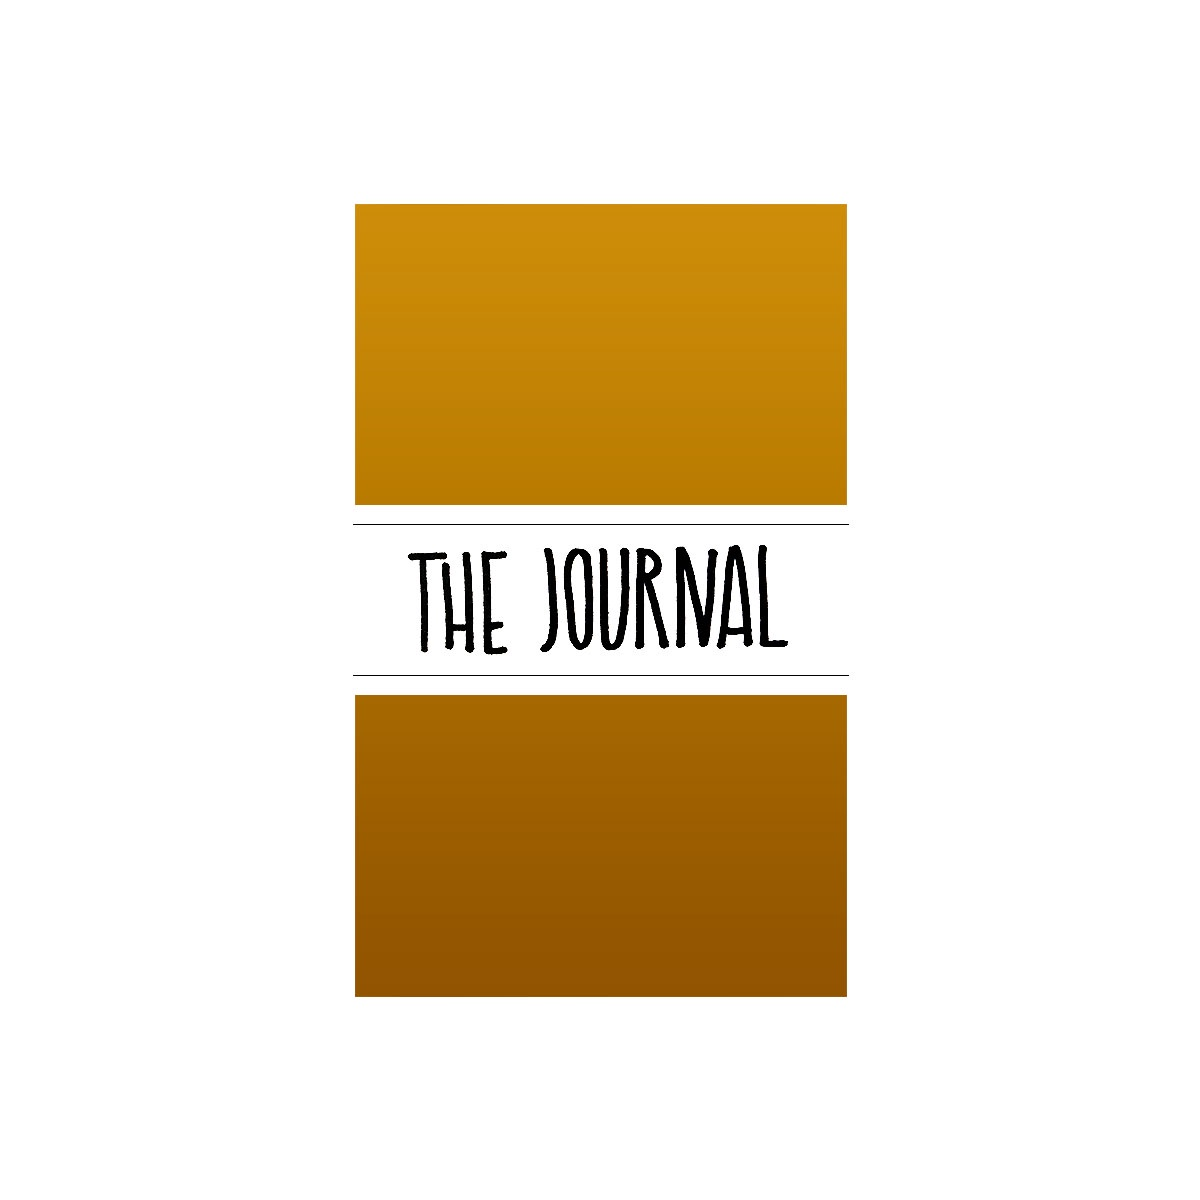 Maxgoodz Ежедневник The Journal Матовое Золото, 2 тетради, В5